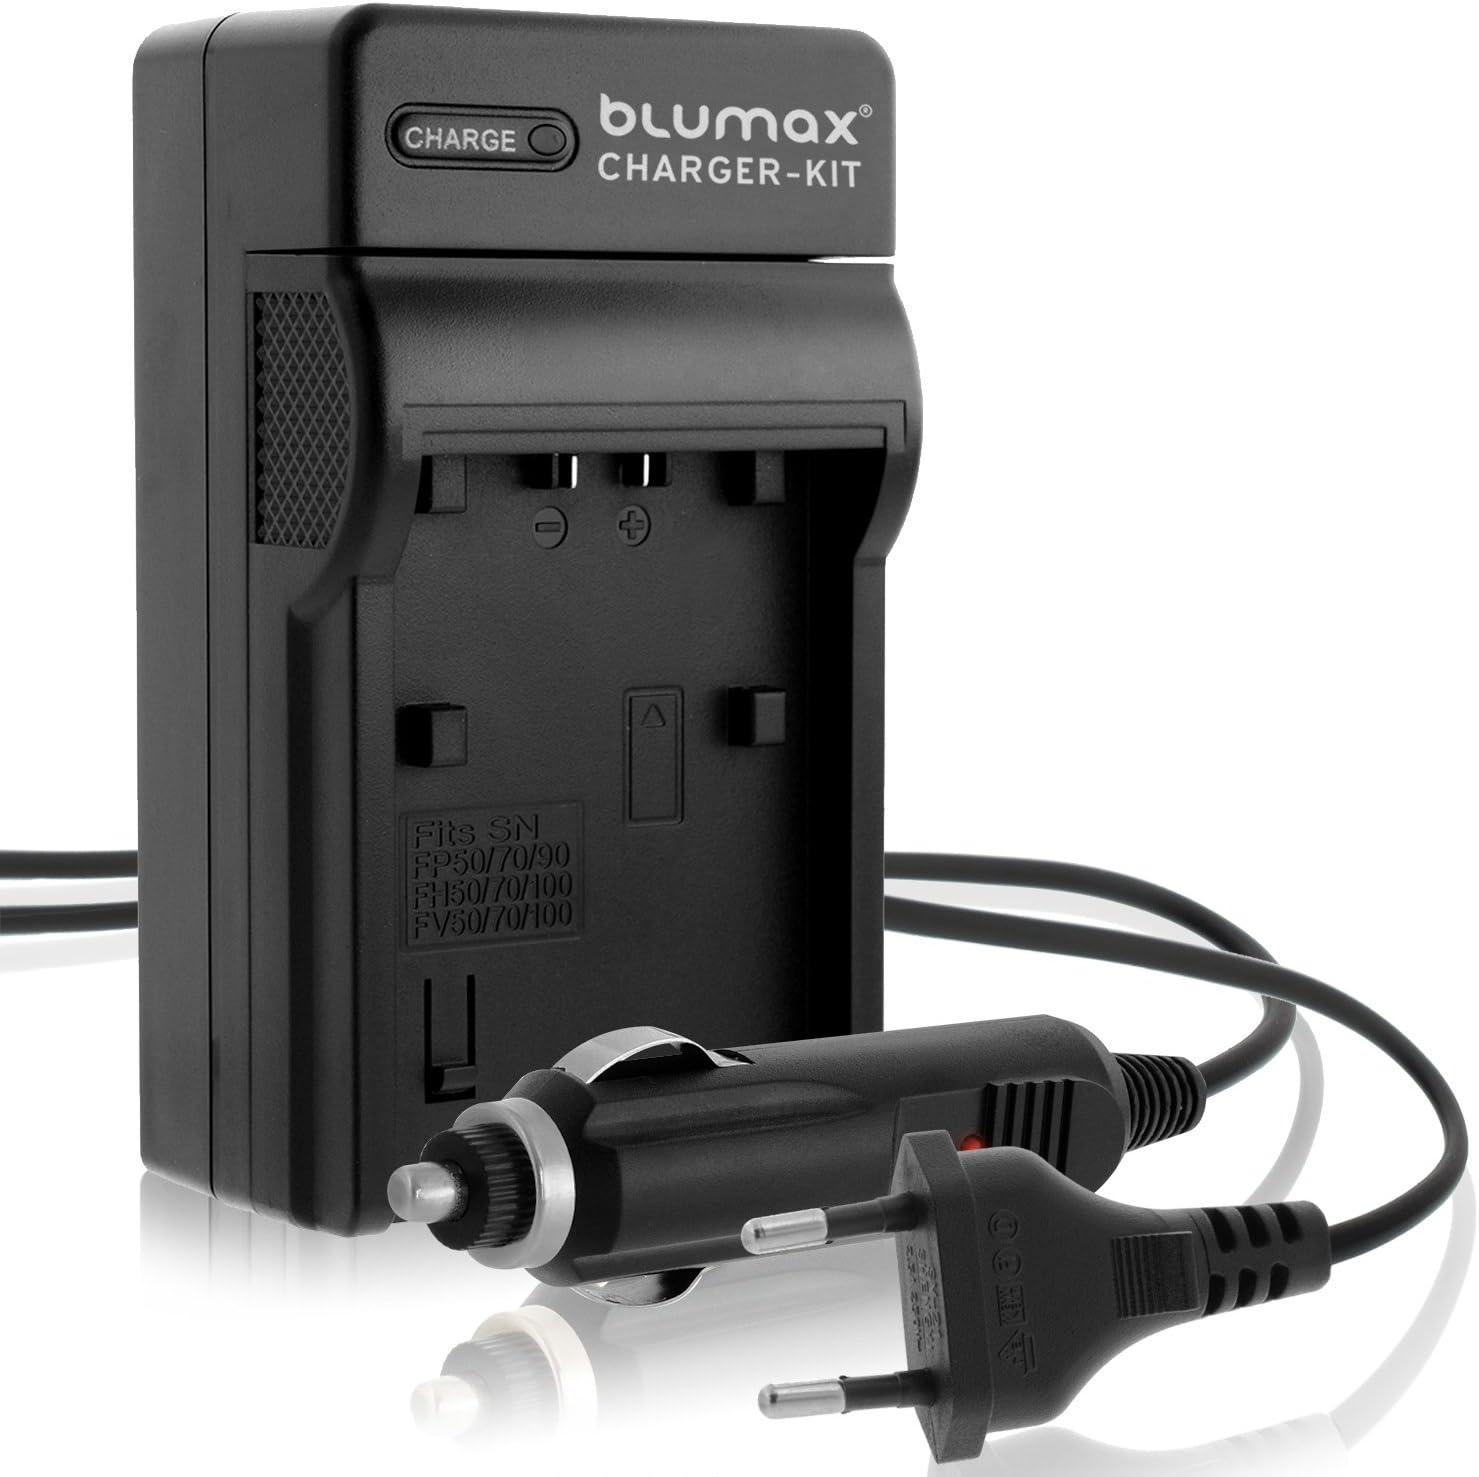 Blumax Np Fv100 Ladegerät Passend Zu Diversen Sony Elektronik